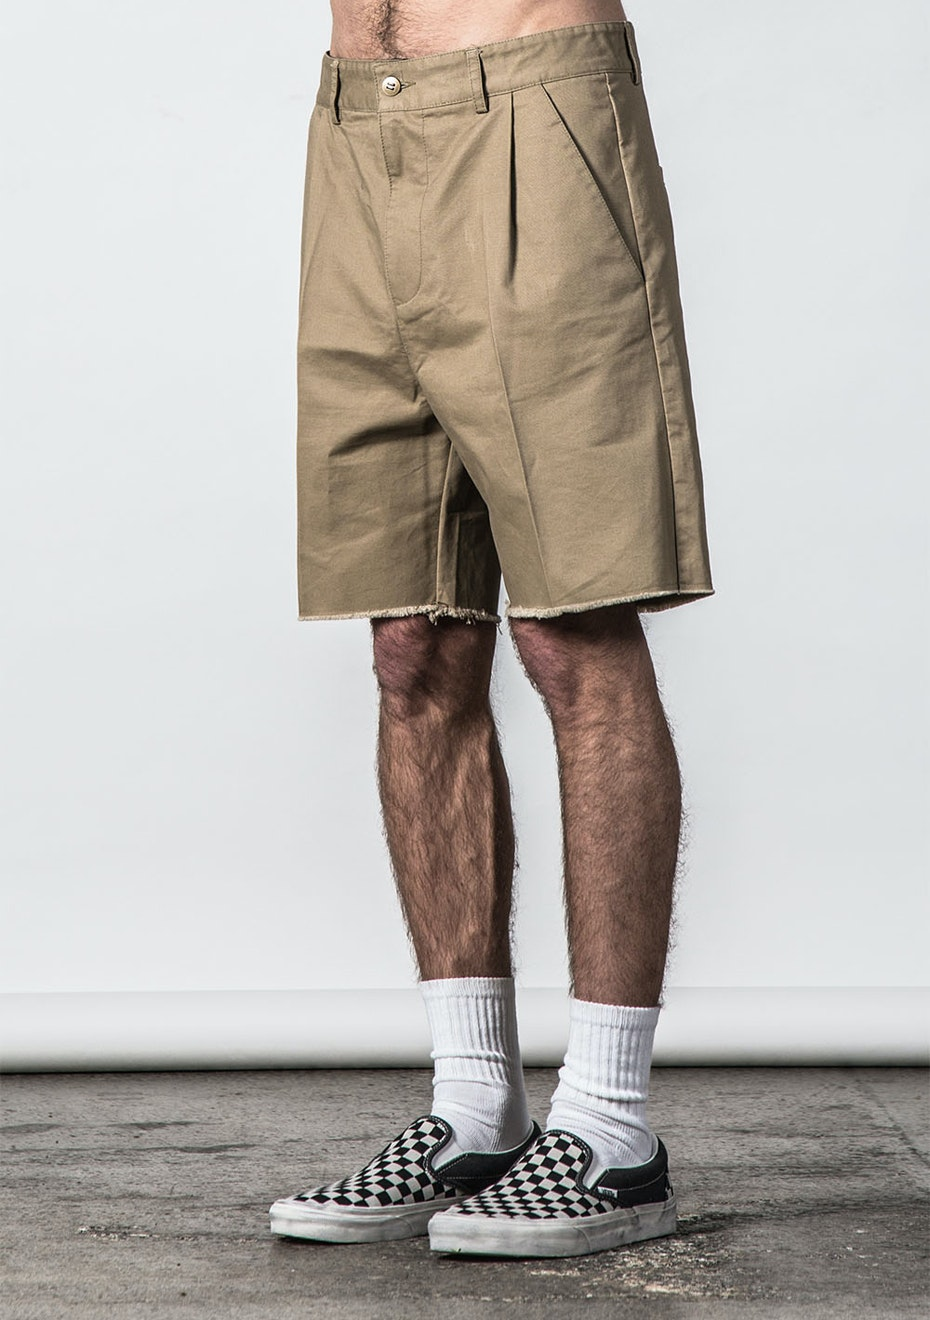 Thing Thing - Heist Short - Tan